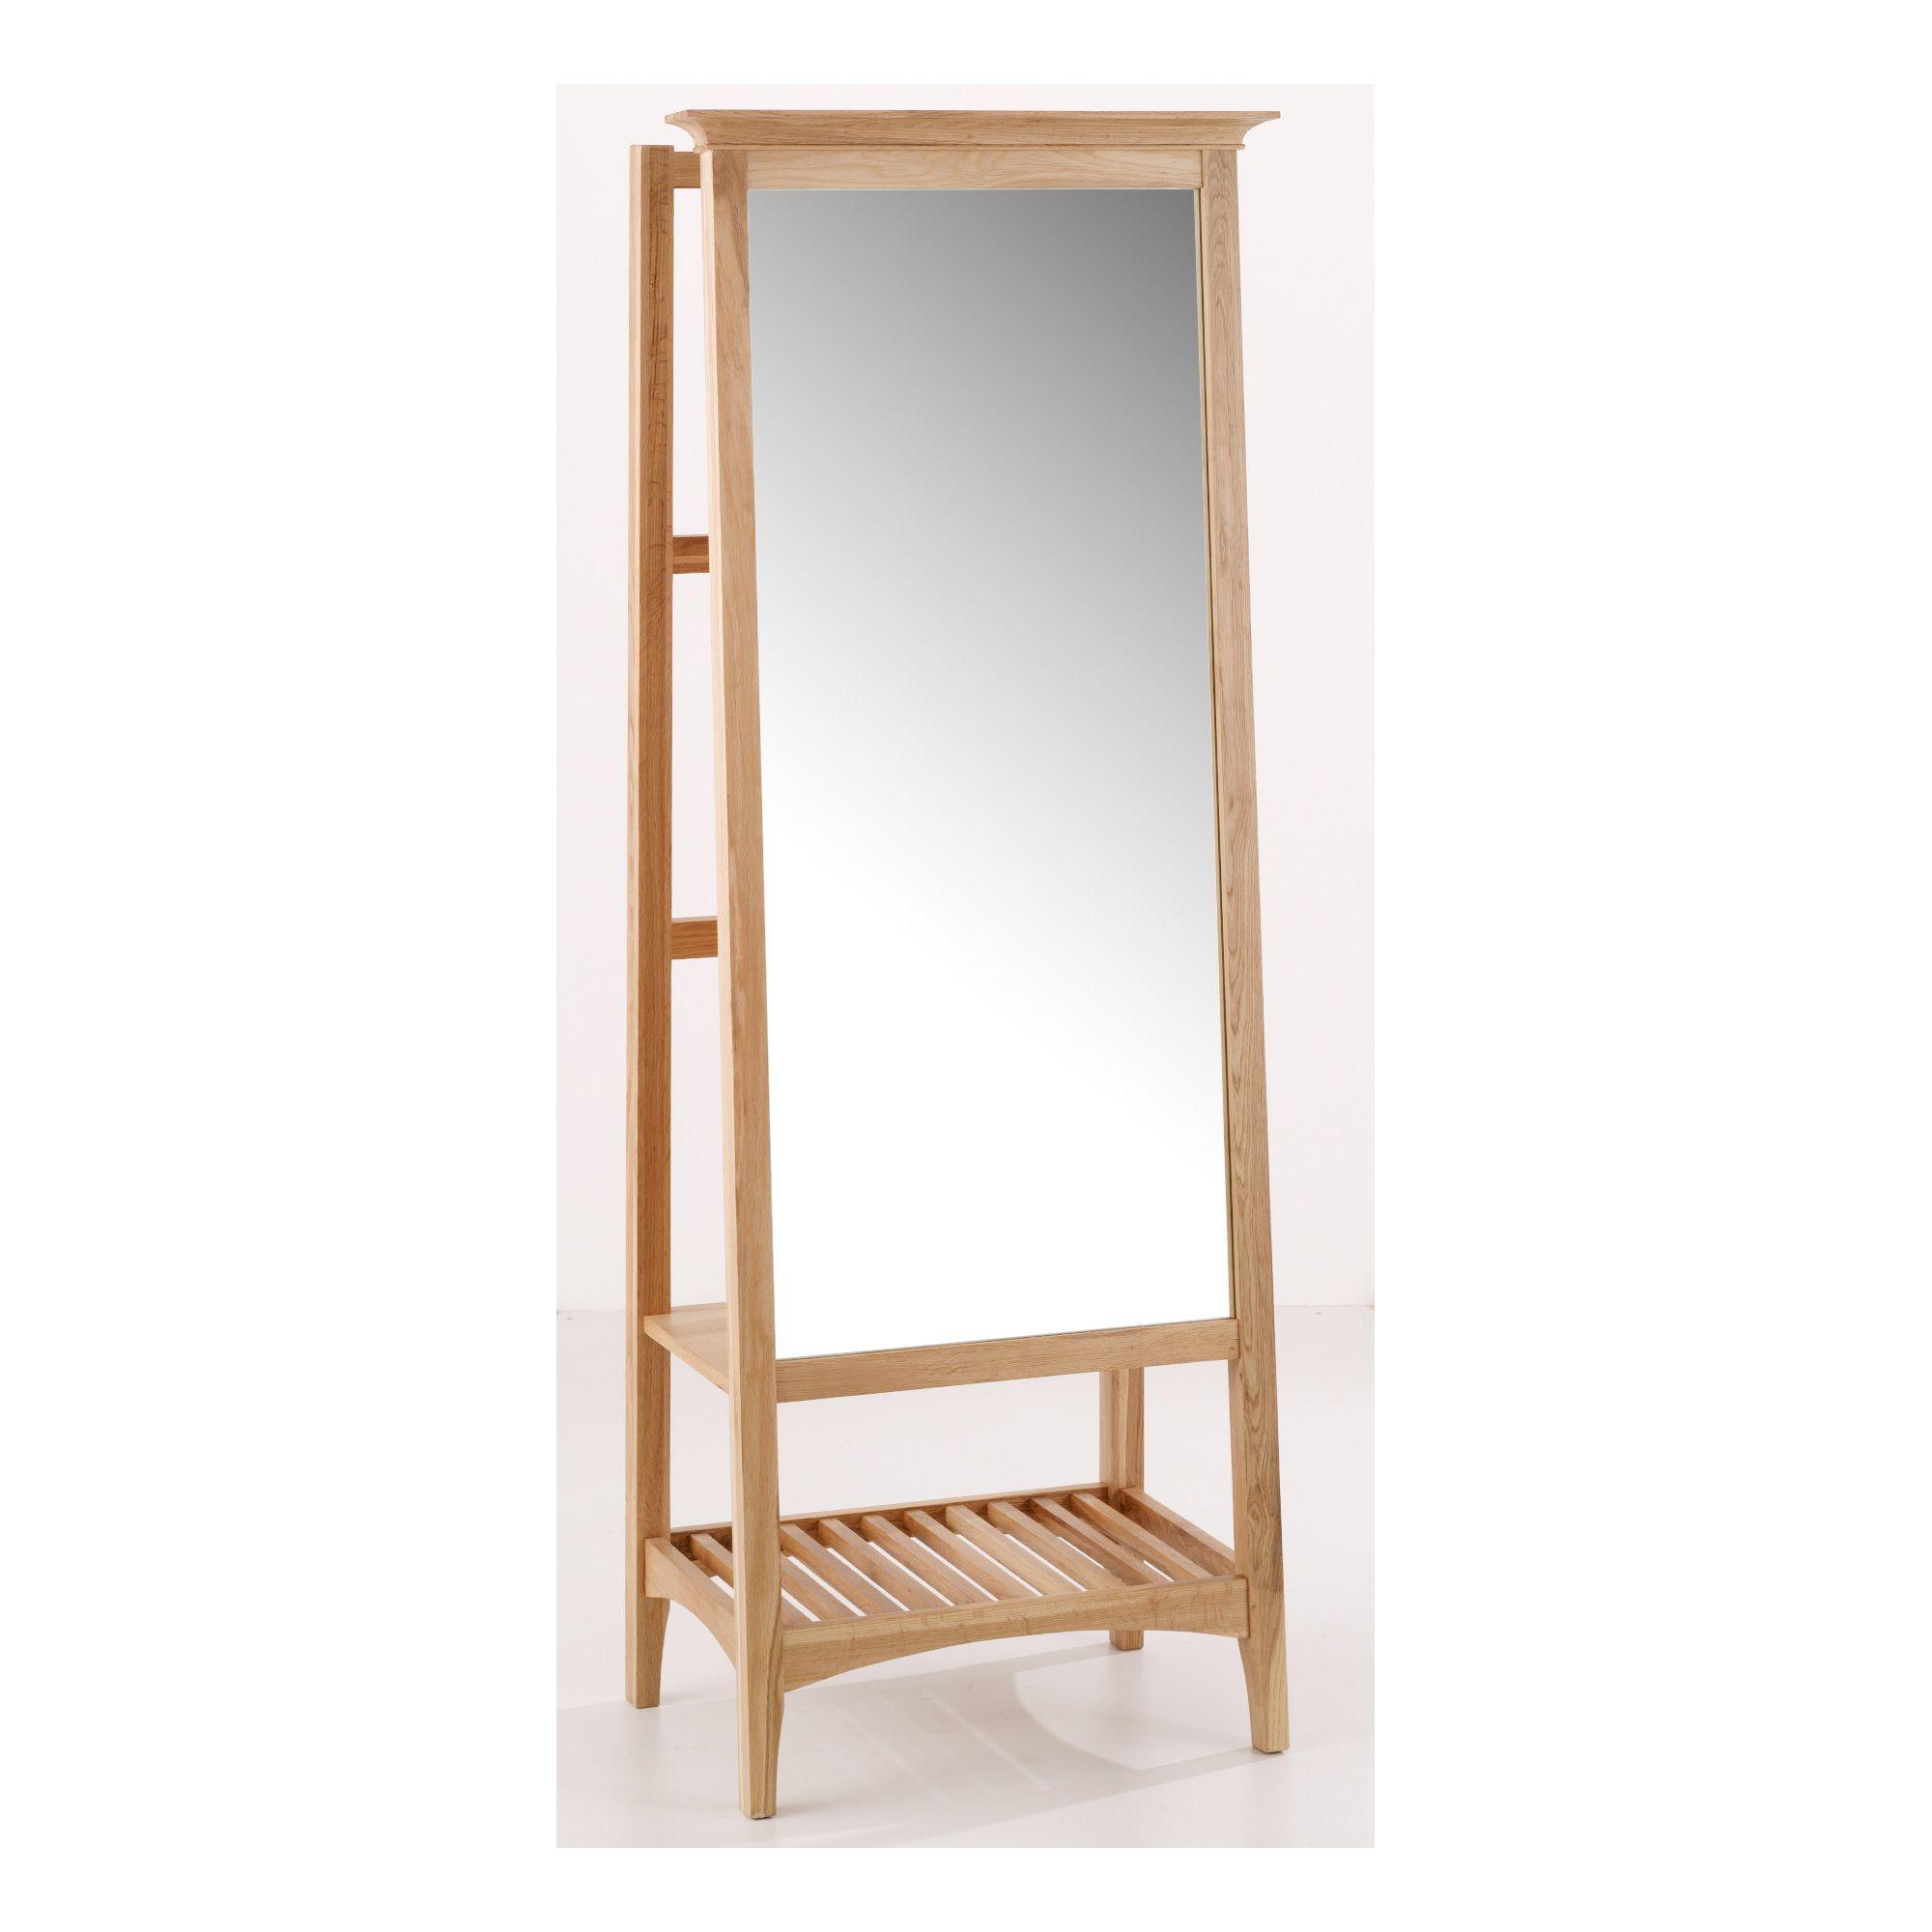 Originals Hudson Bedroom Cheval Dressing Mirror at Tesco Direct